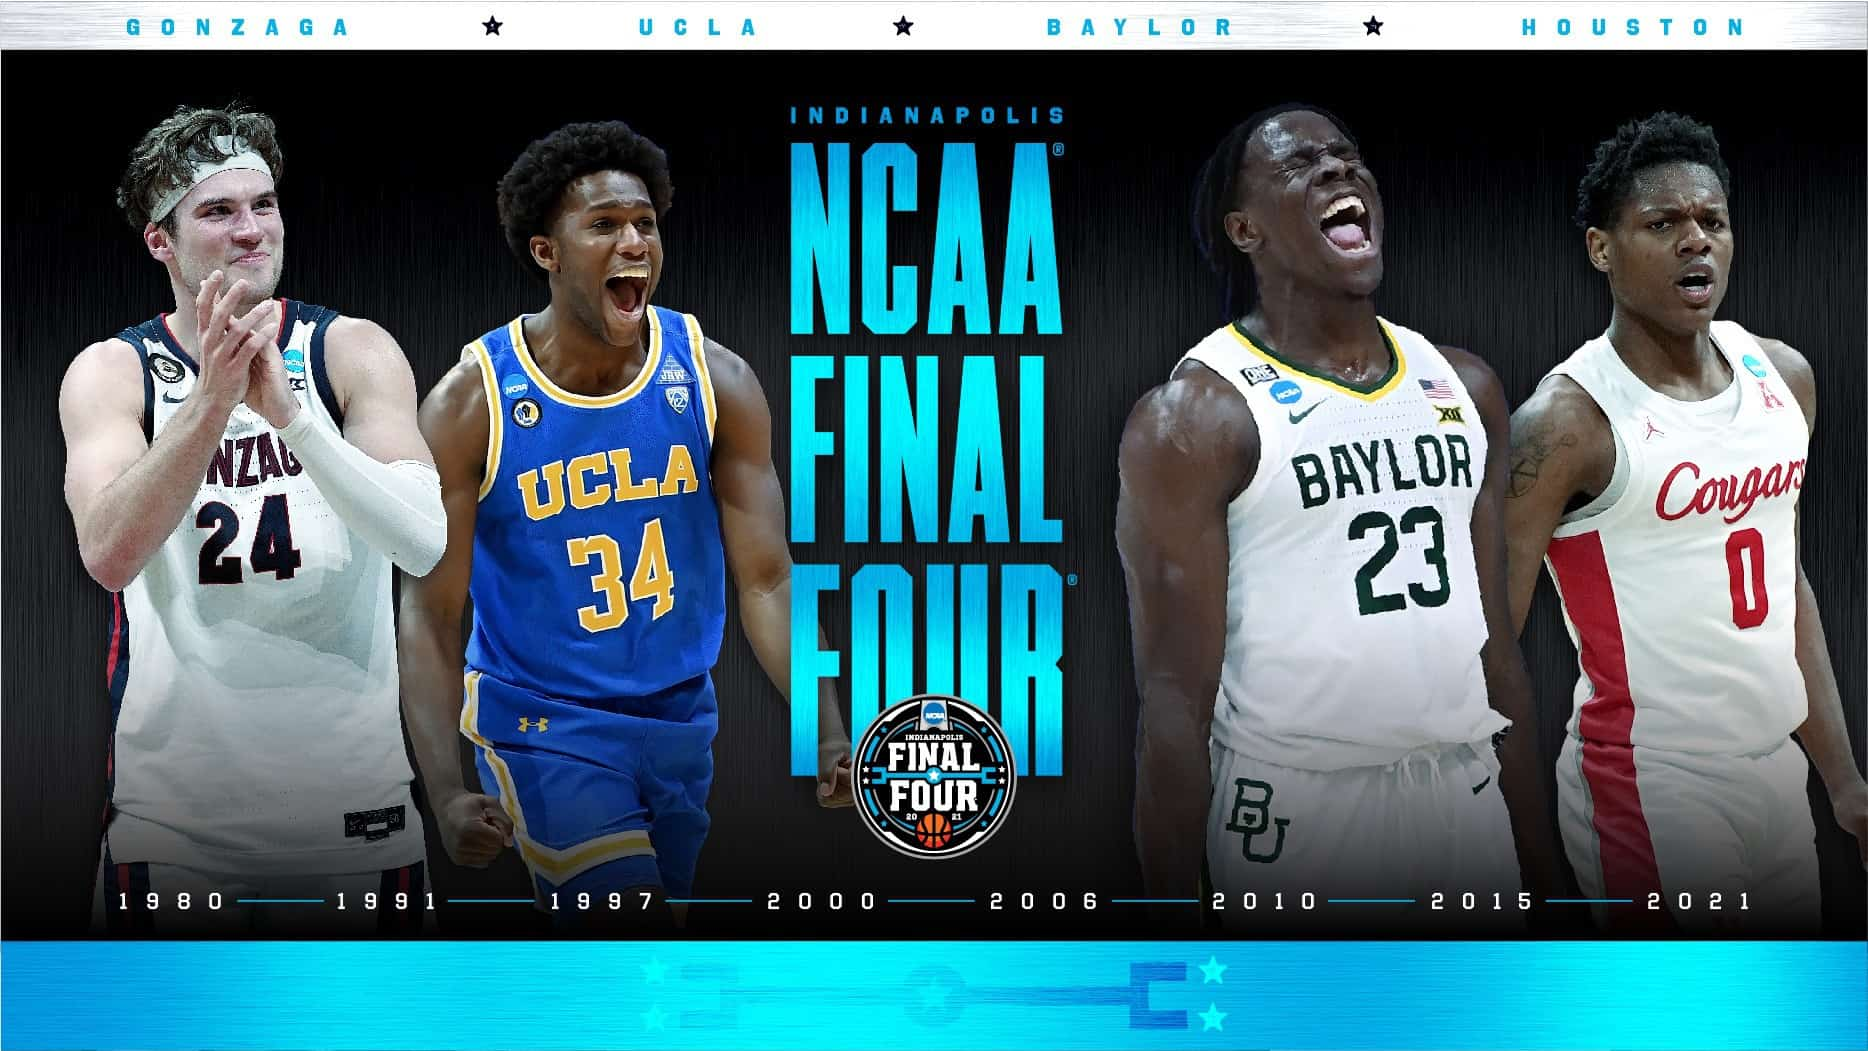 Zags, Baylor, Houston, UCLA: ecco le Final Four